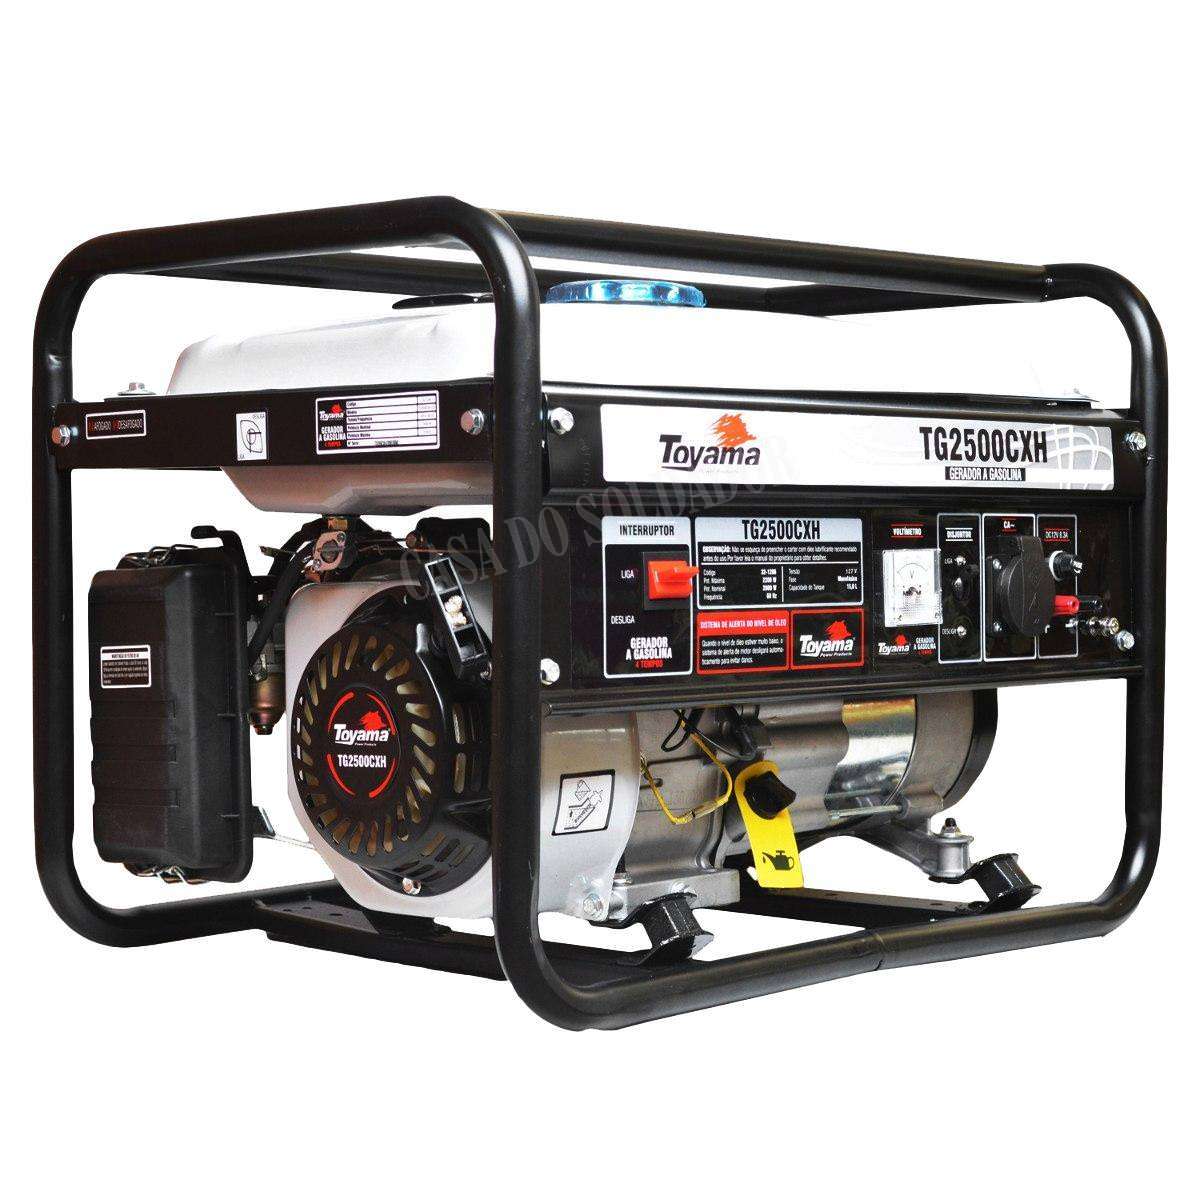 Gerador de Energia a Gasolina 4T TG2500CXH-220 V Toyama